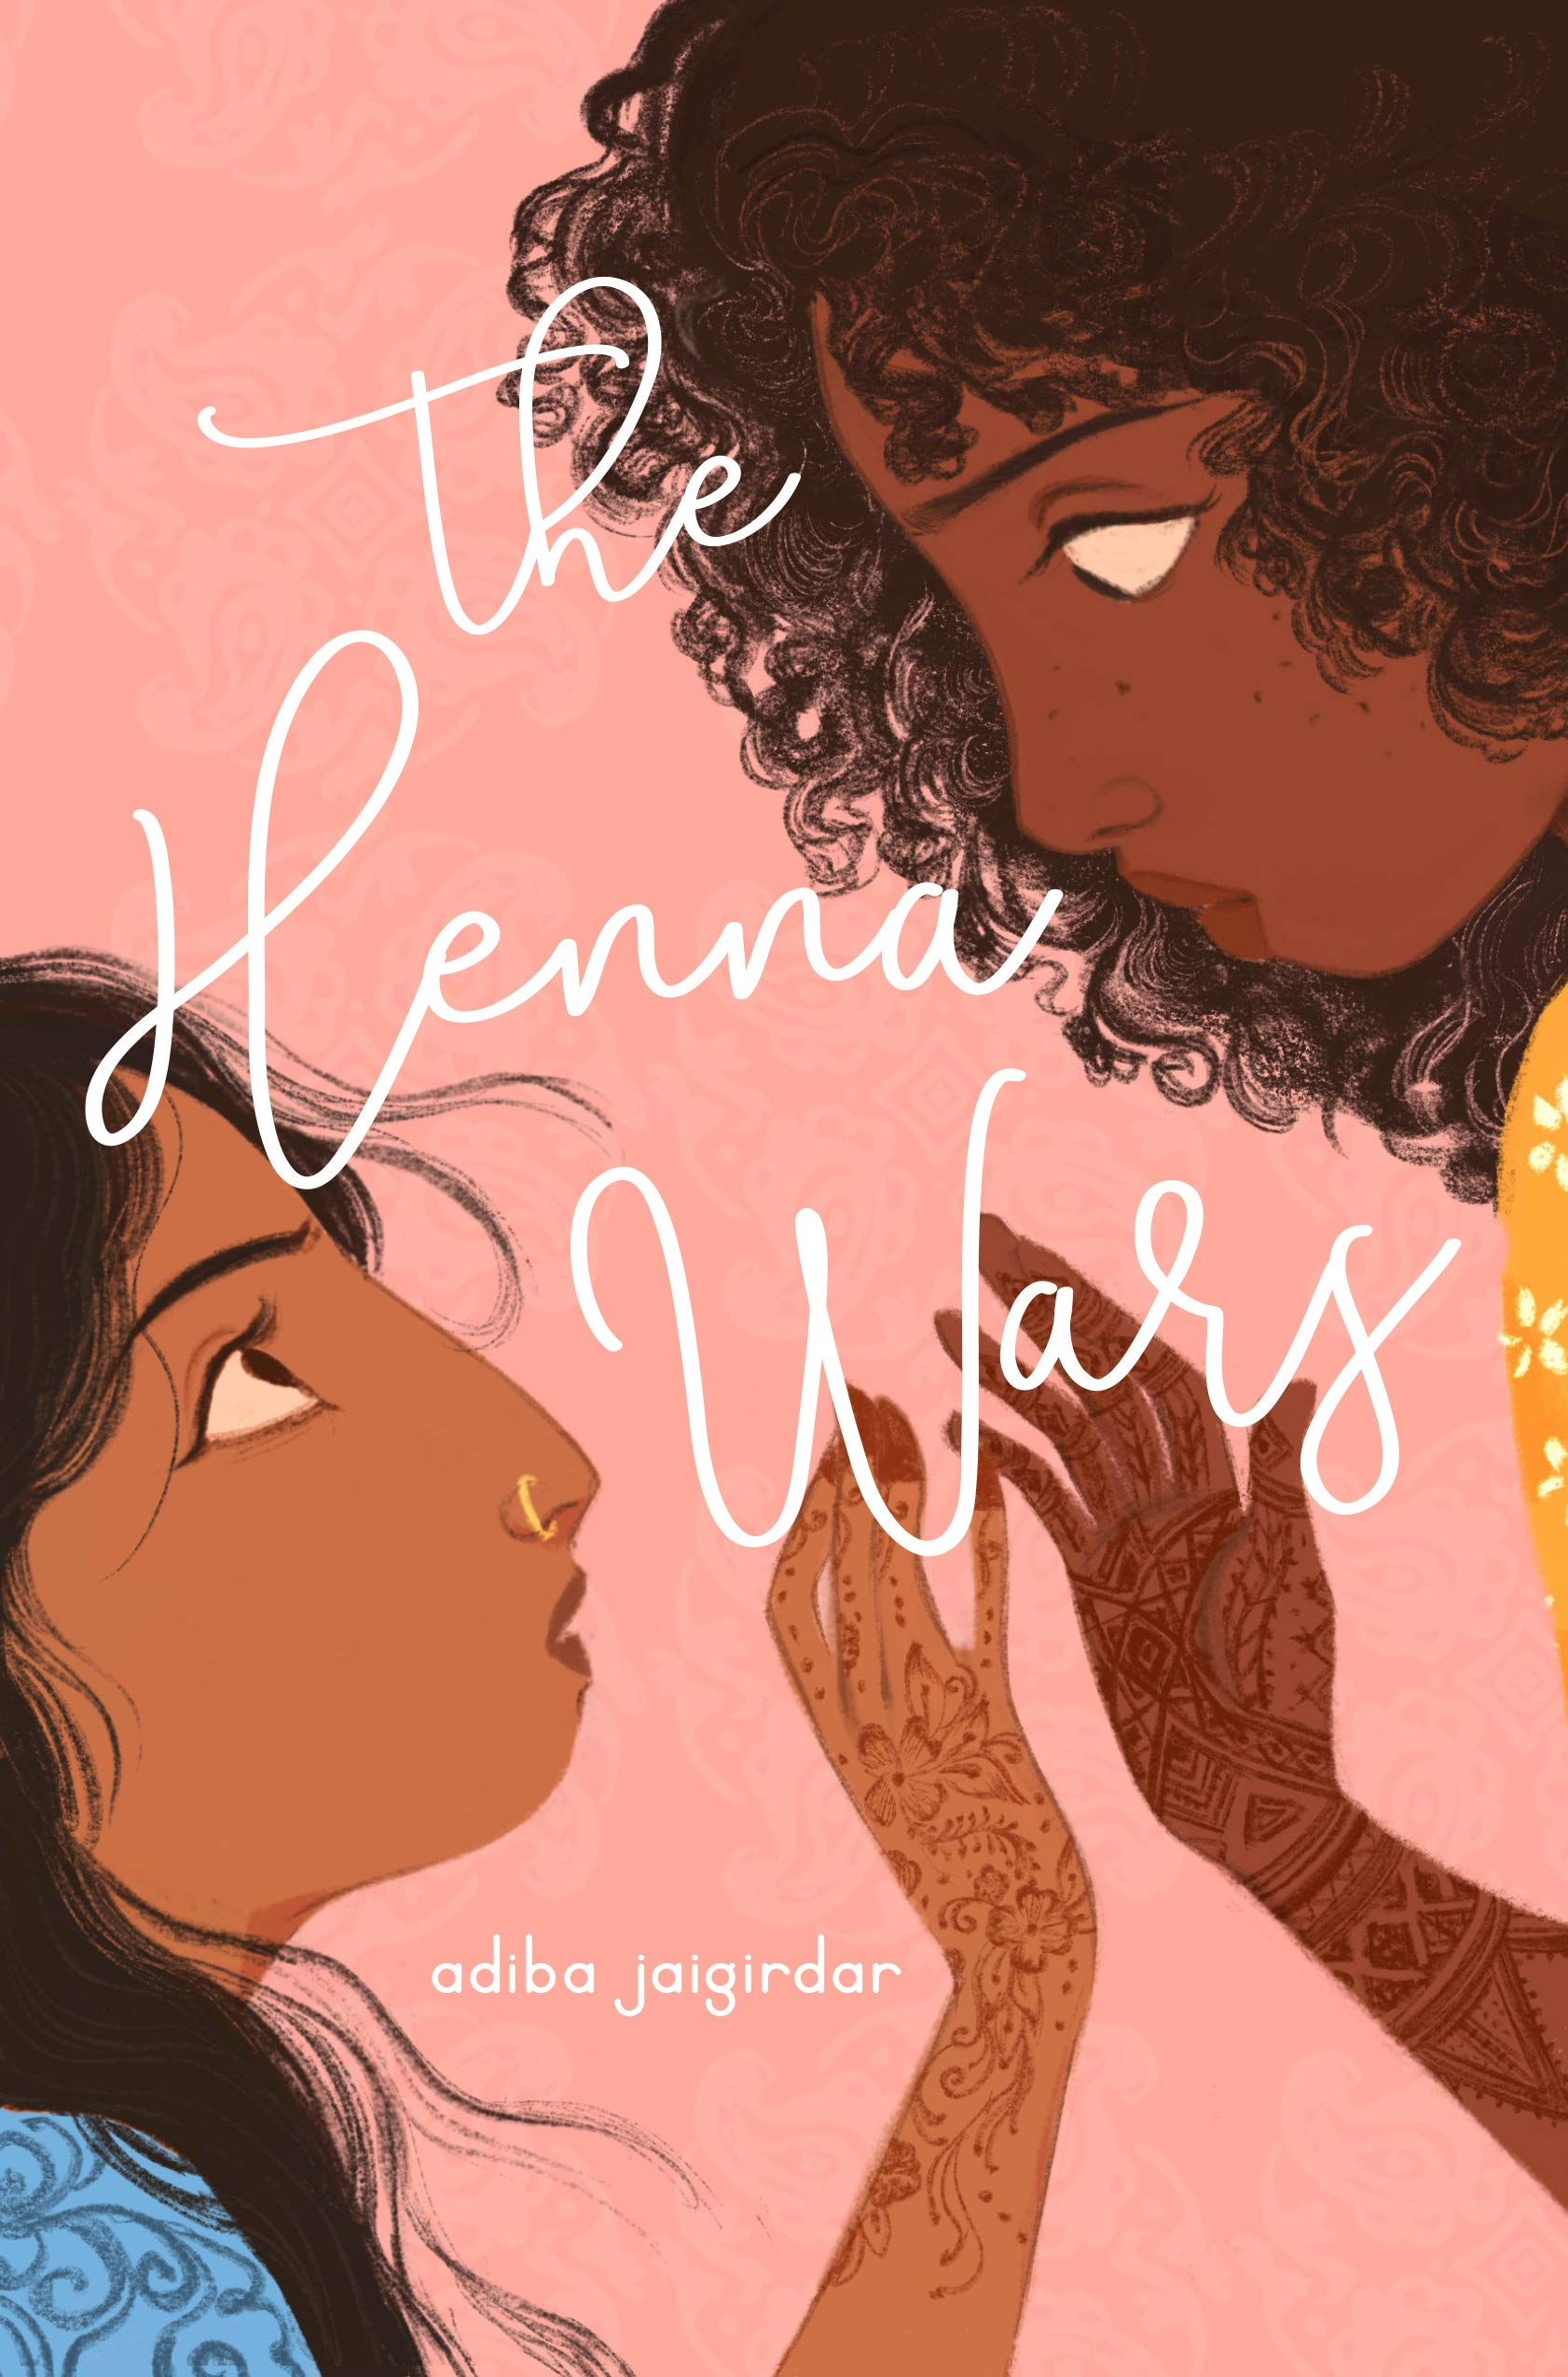 Amazon.com: The Henna Wars (9781624149689): Jaigirdar, Adiba: Books